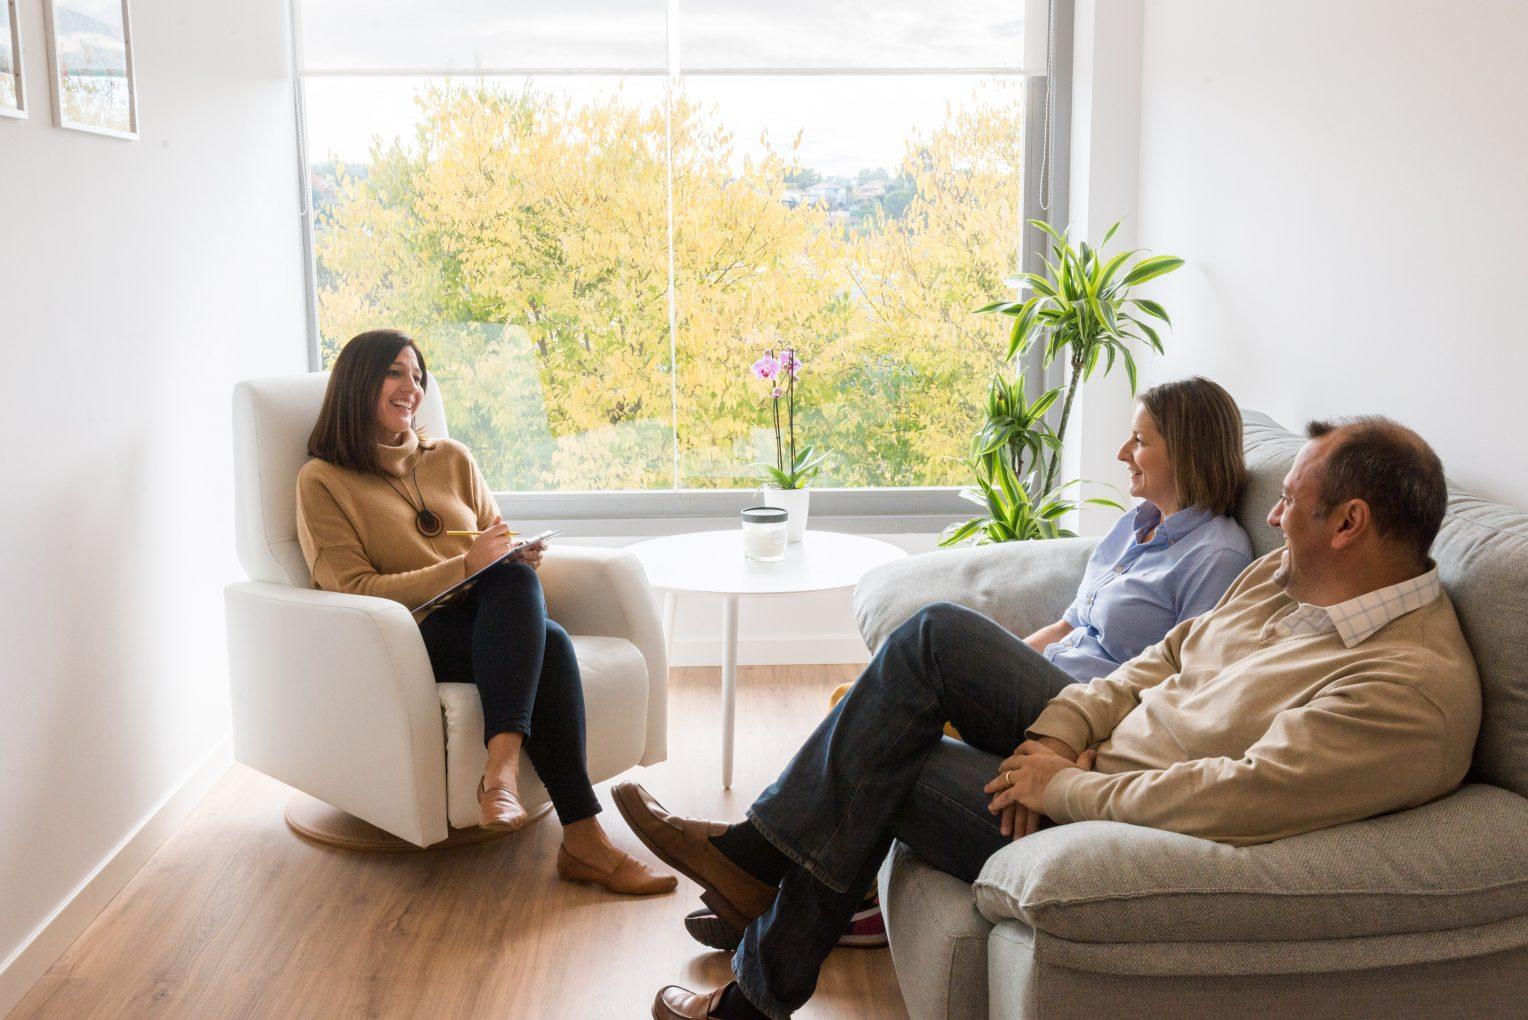 psicoterapia para adultos en sant cugat